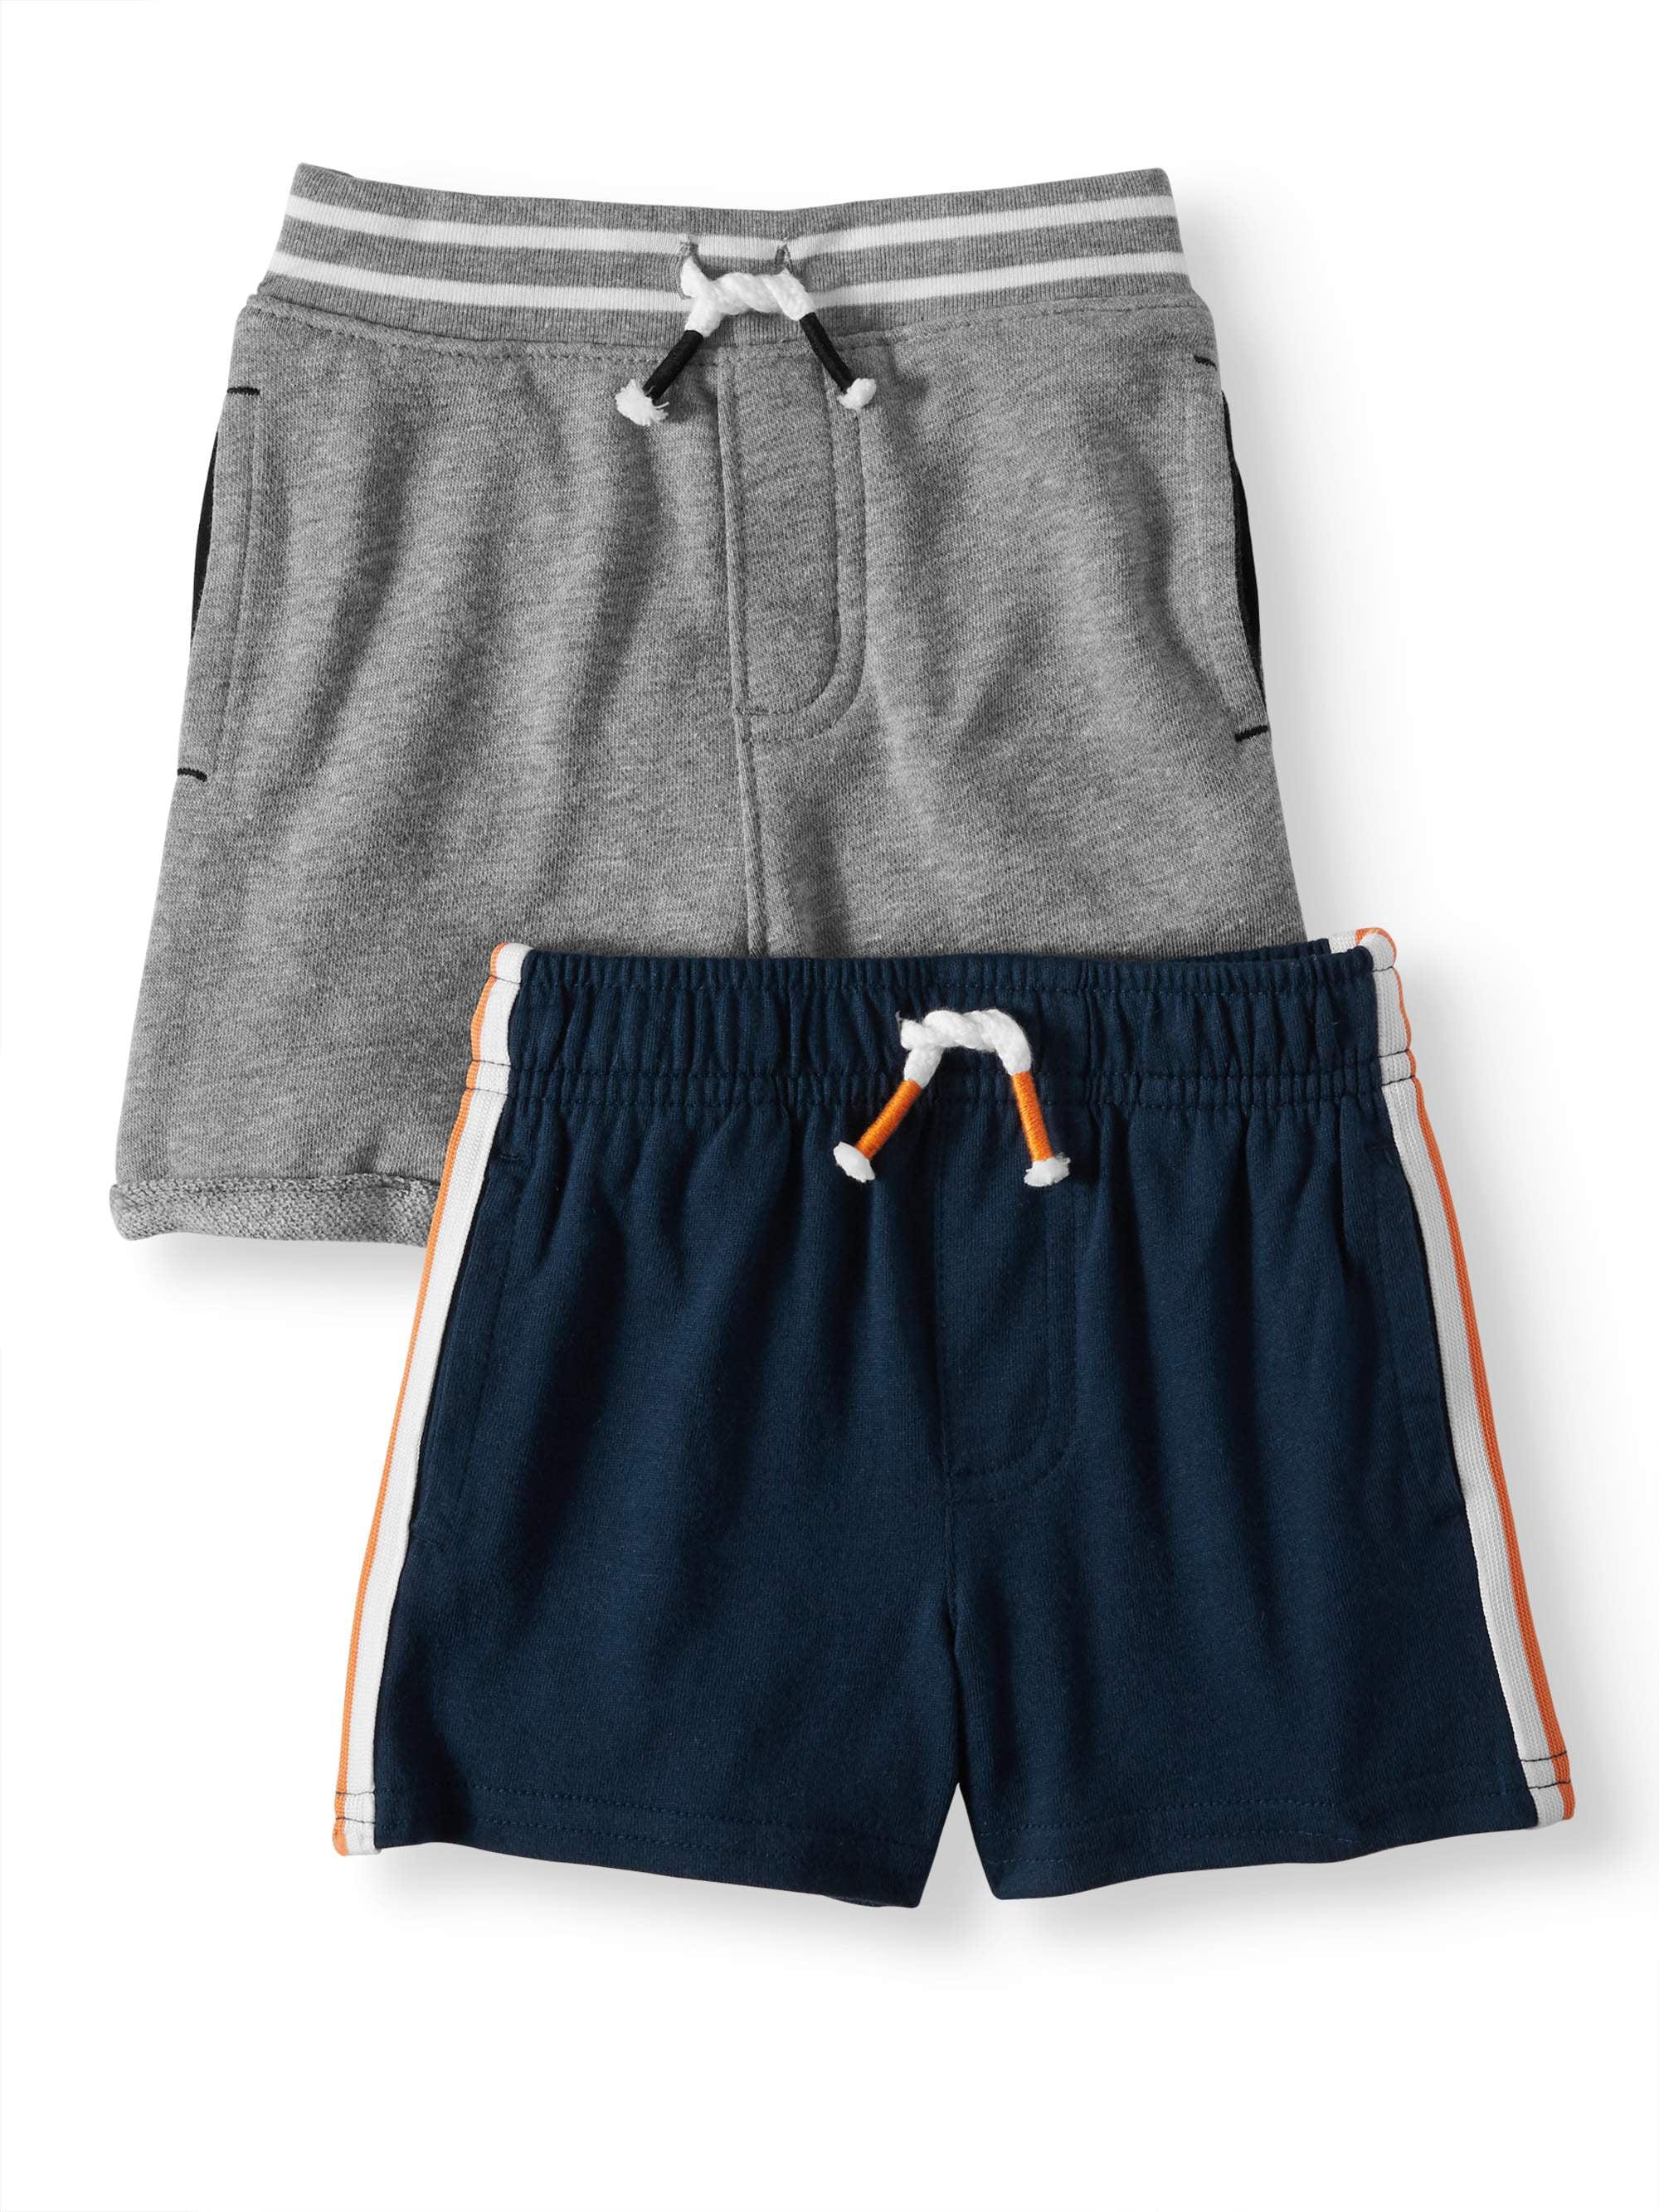 2T Route 66 Toddler Boys Canvas Shorts Orange